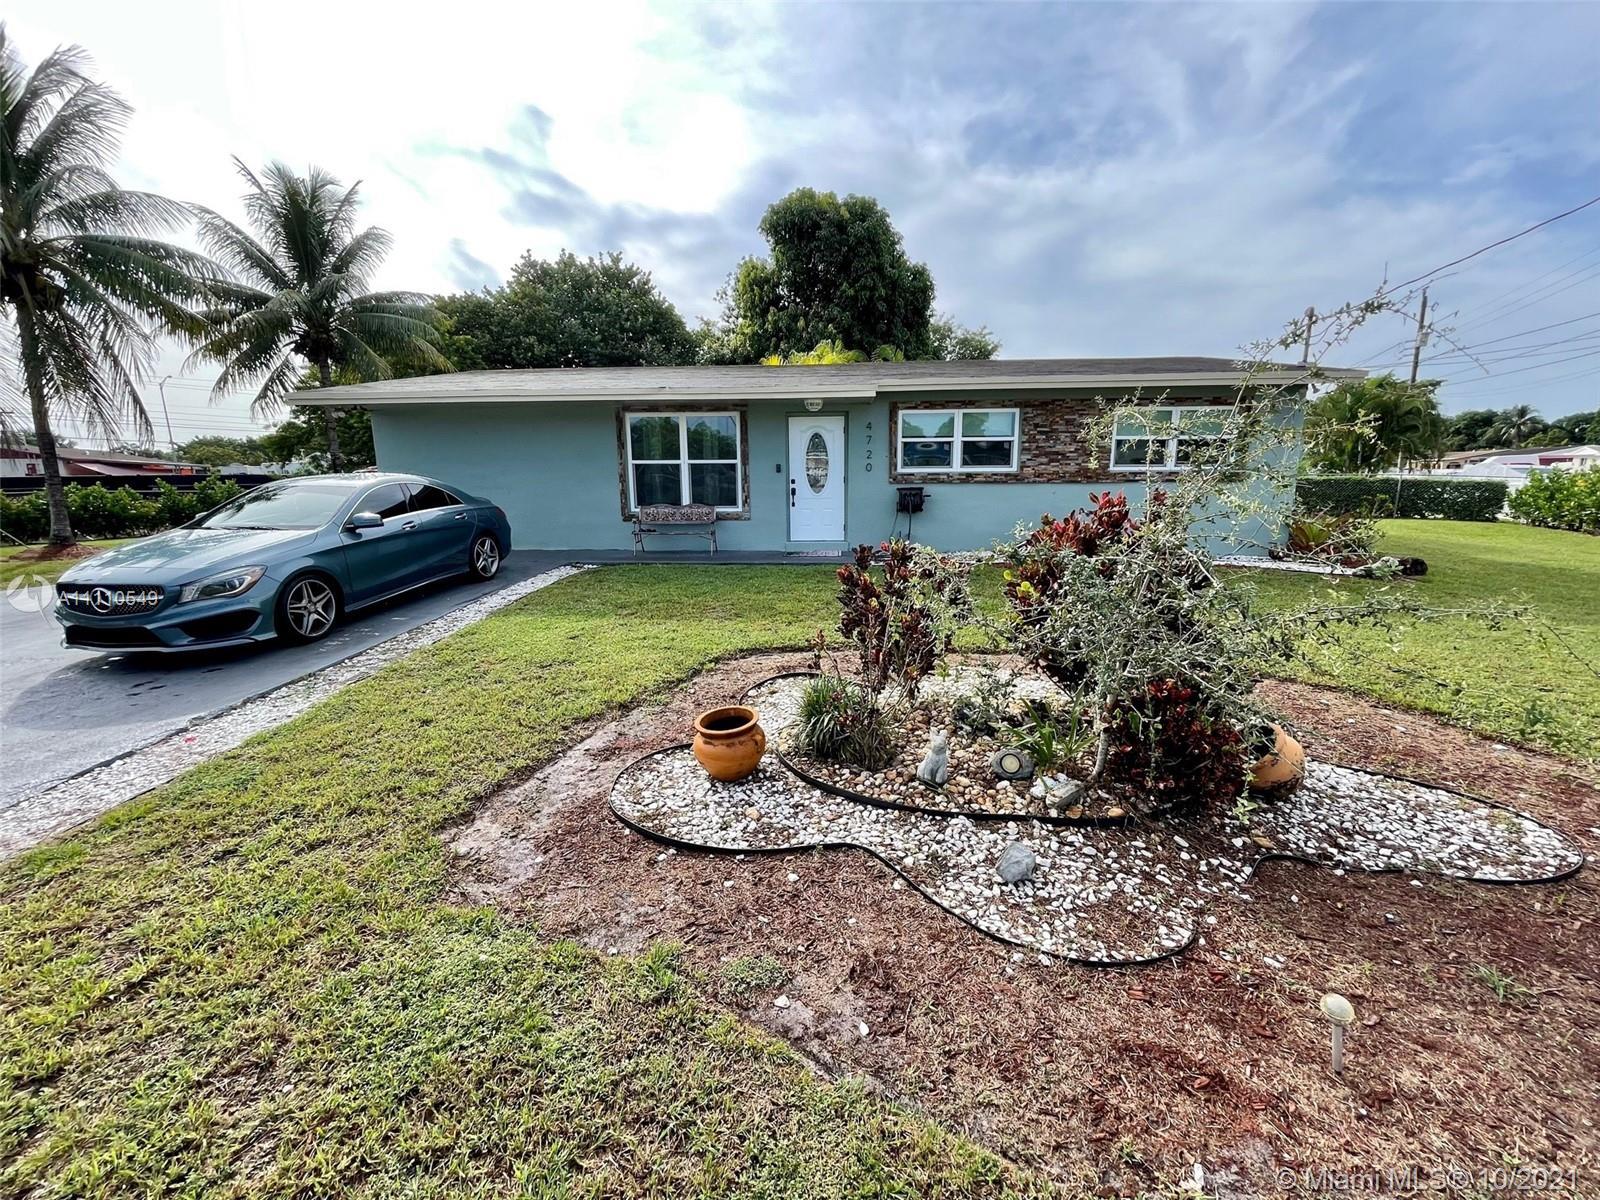 Single Family Home,For Sale,4720 NW 173rd Dr, Miami Gardens, Florida 33055,Brickell,realty,broker,condos near me